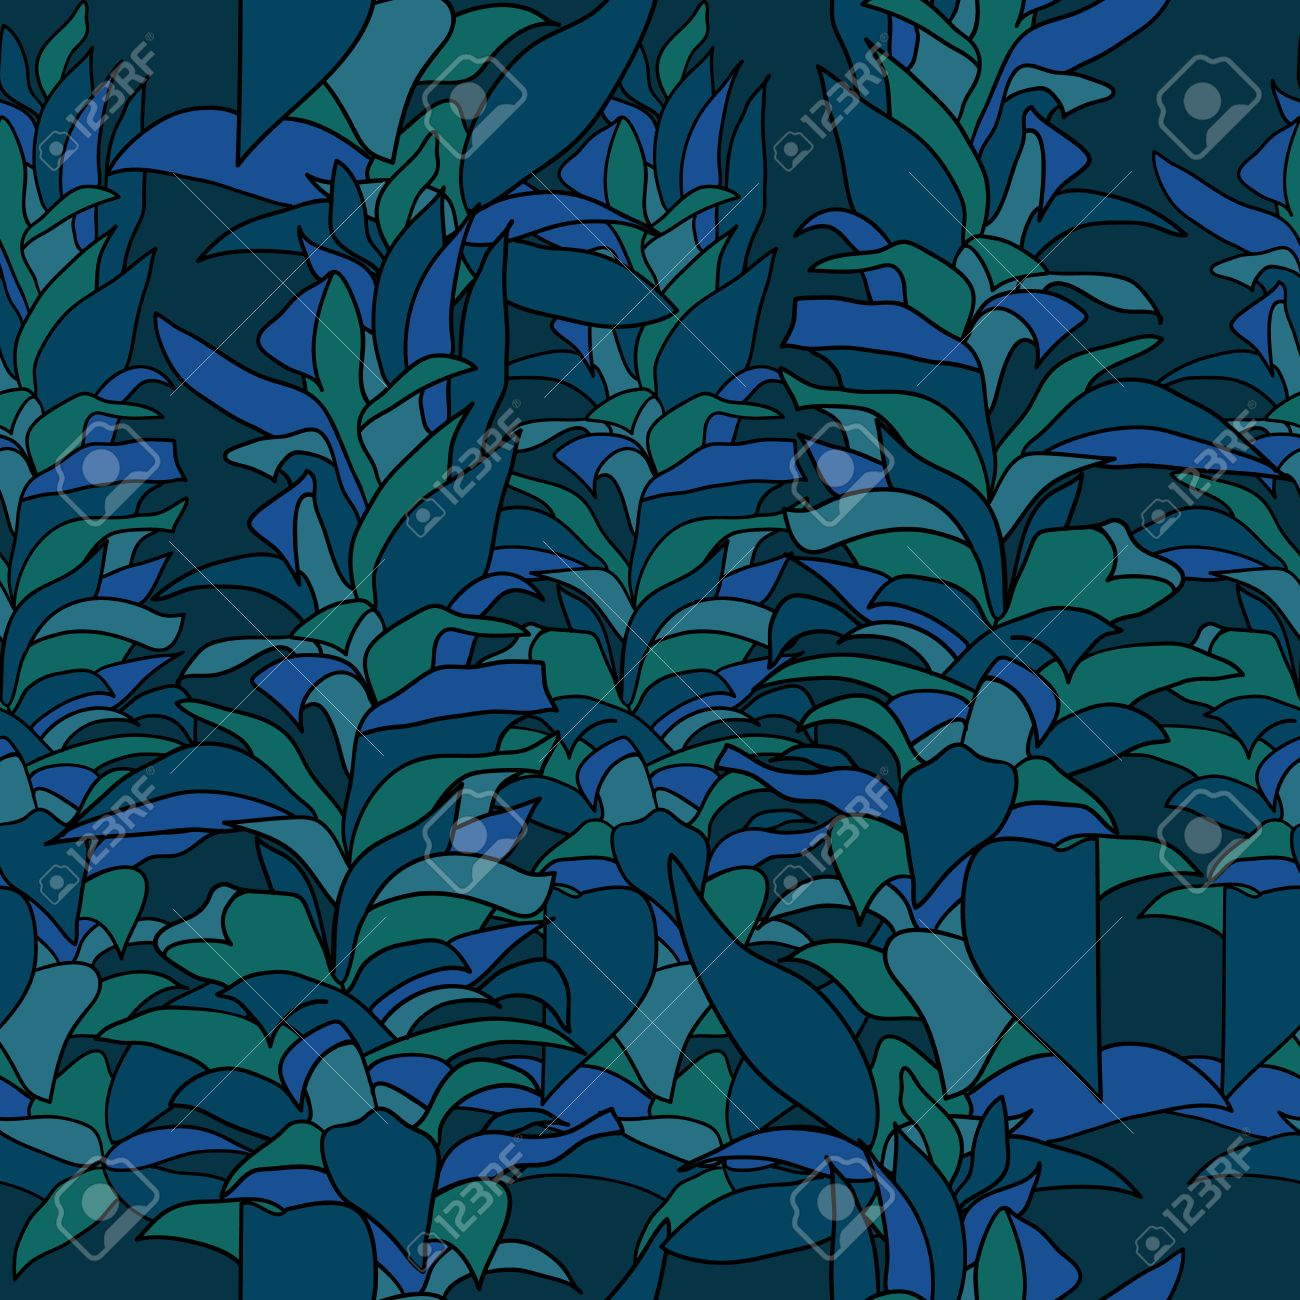 Seamless underwater texture Animated Marine Algae Seamless Pattern Repetition Texture With Underwater Plants Stock Vector 49819663 123rfcom Marine Algae Seamless Pattern Repetition Texture With Underwater